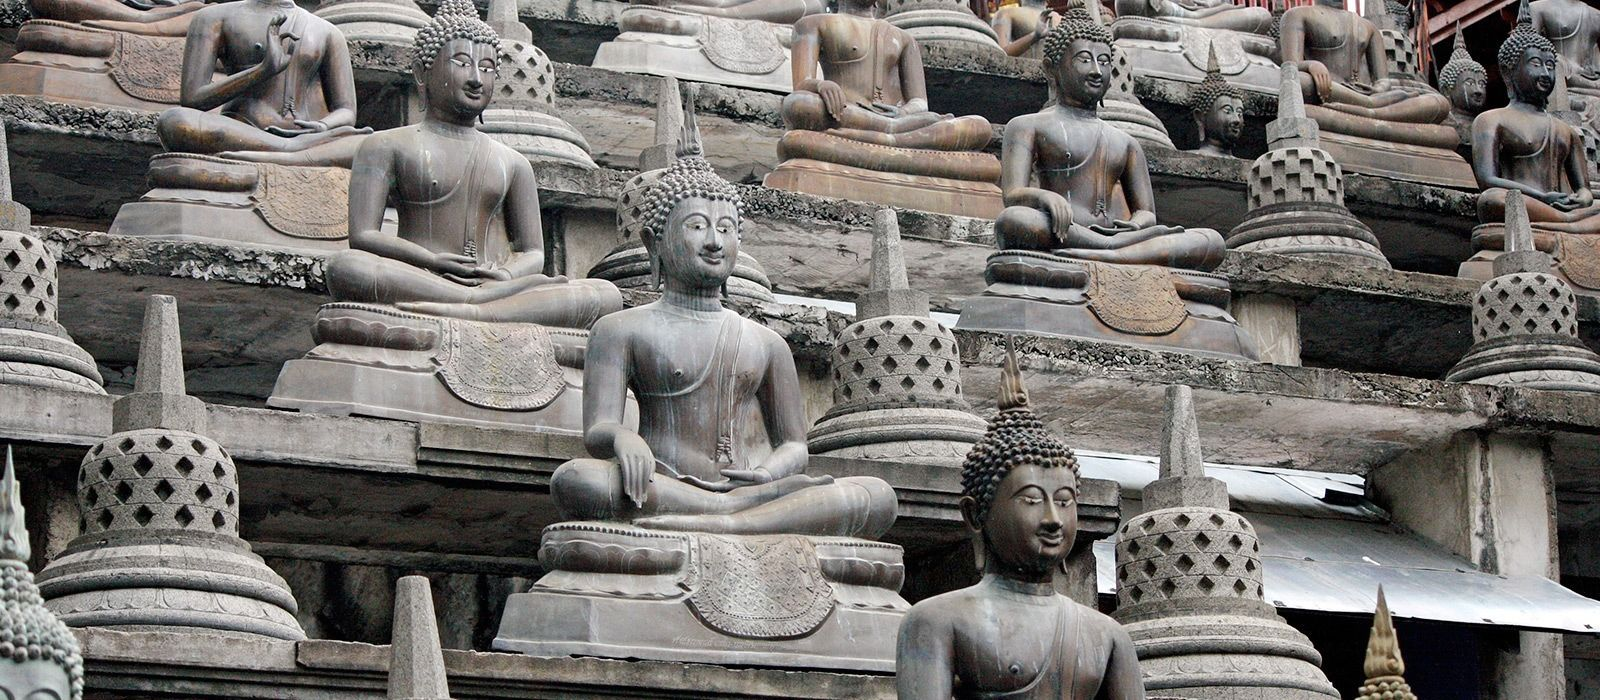 Luxuriös und hautnah – Große Sri Lanka Rundreise Urlaub 6